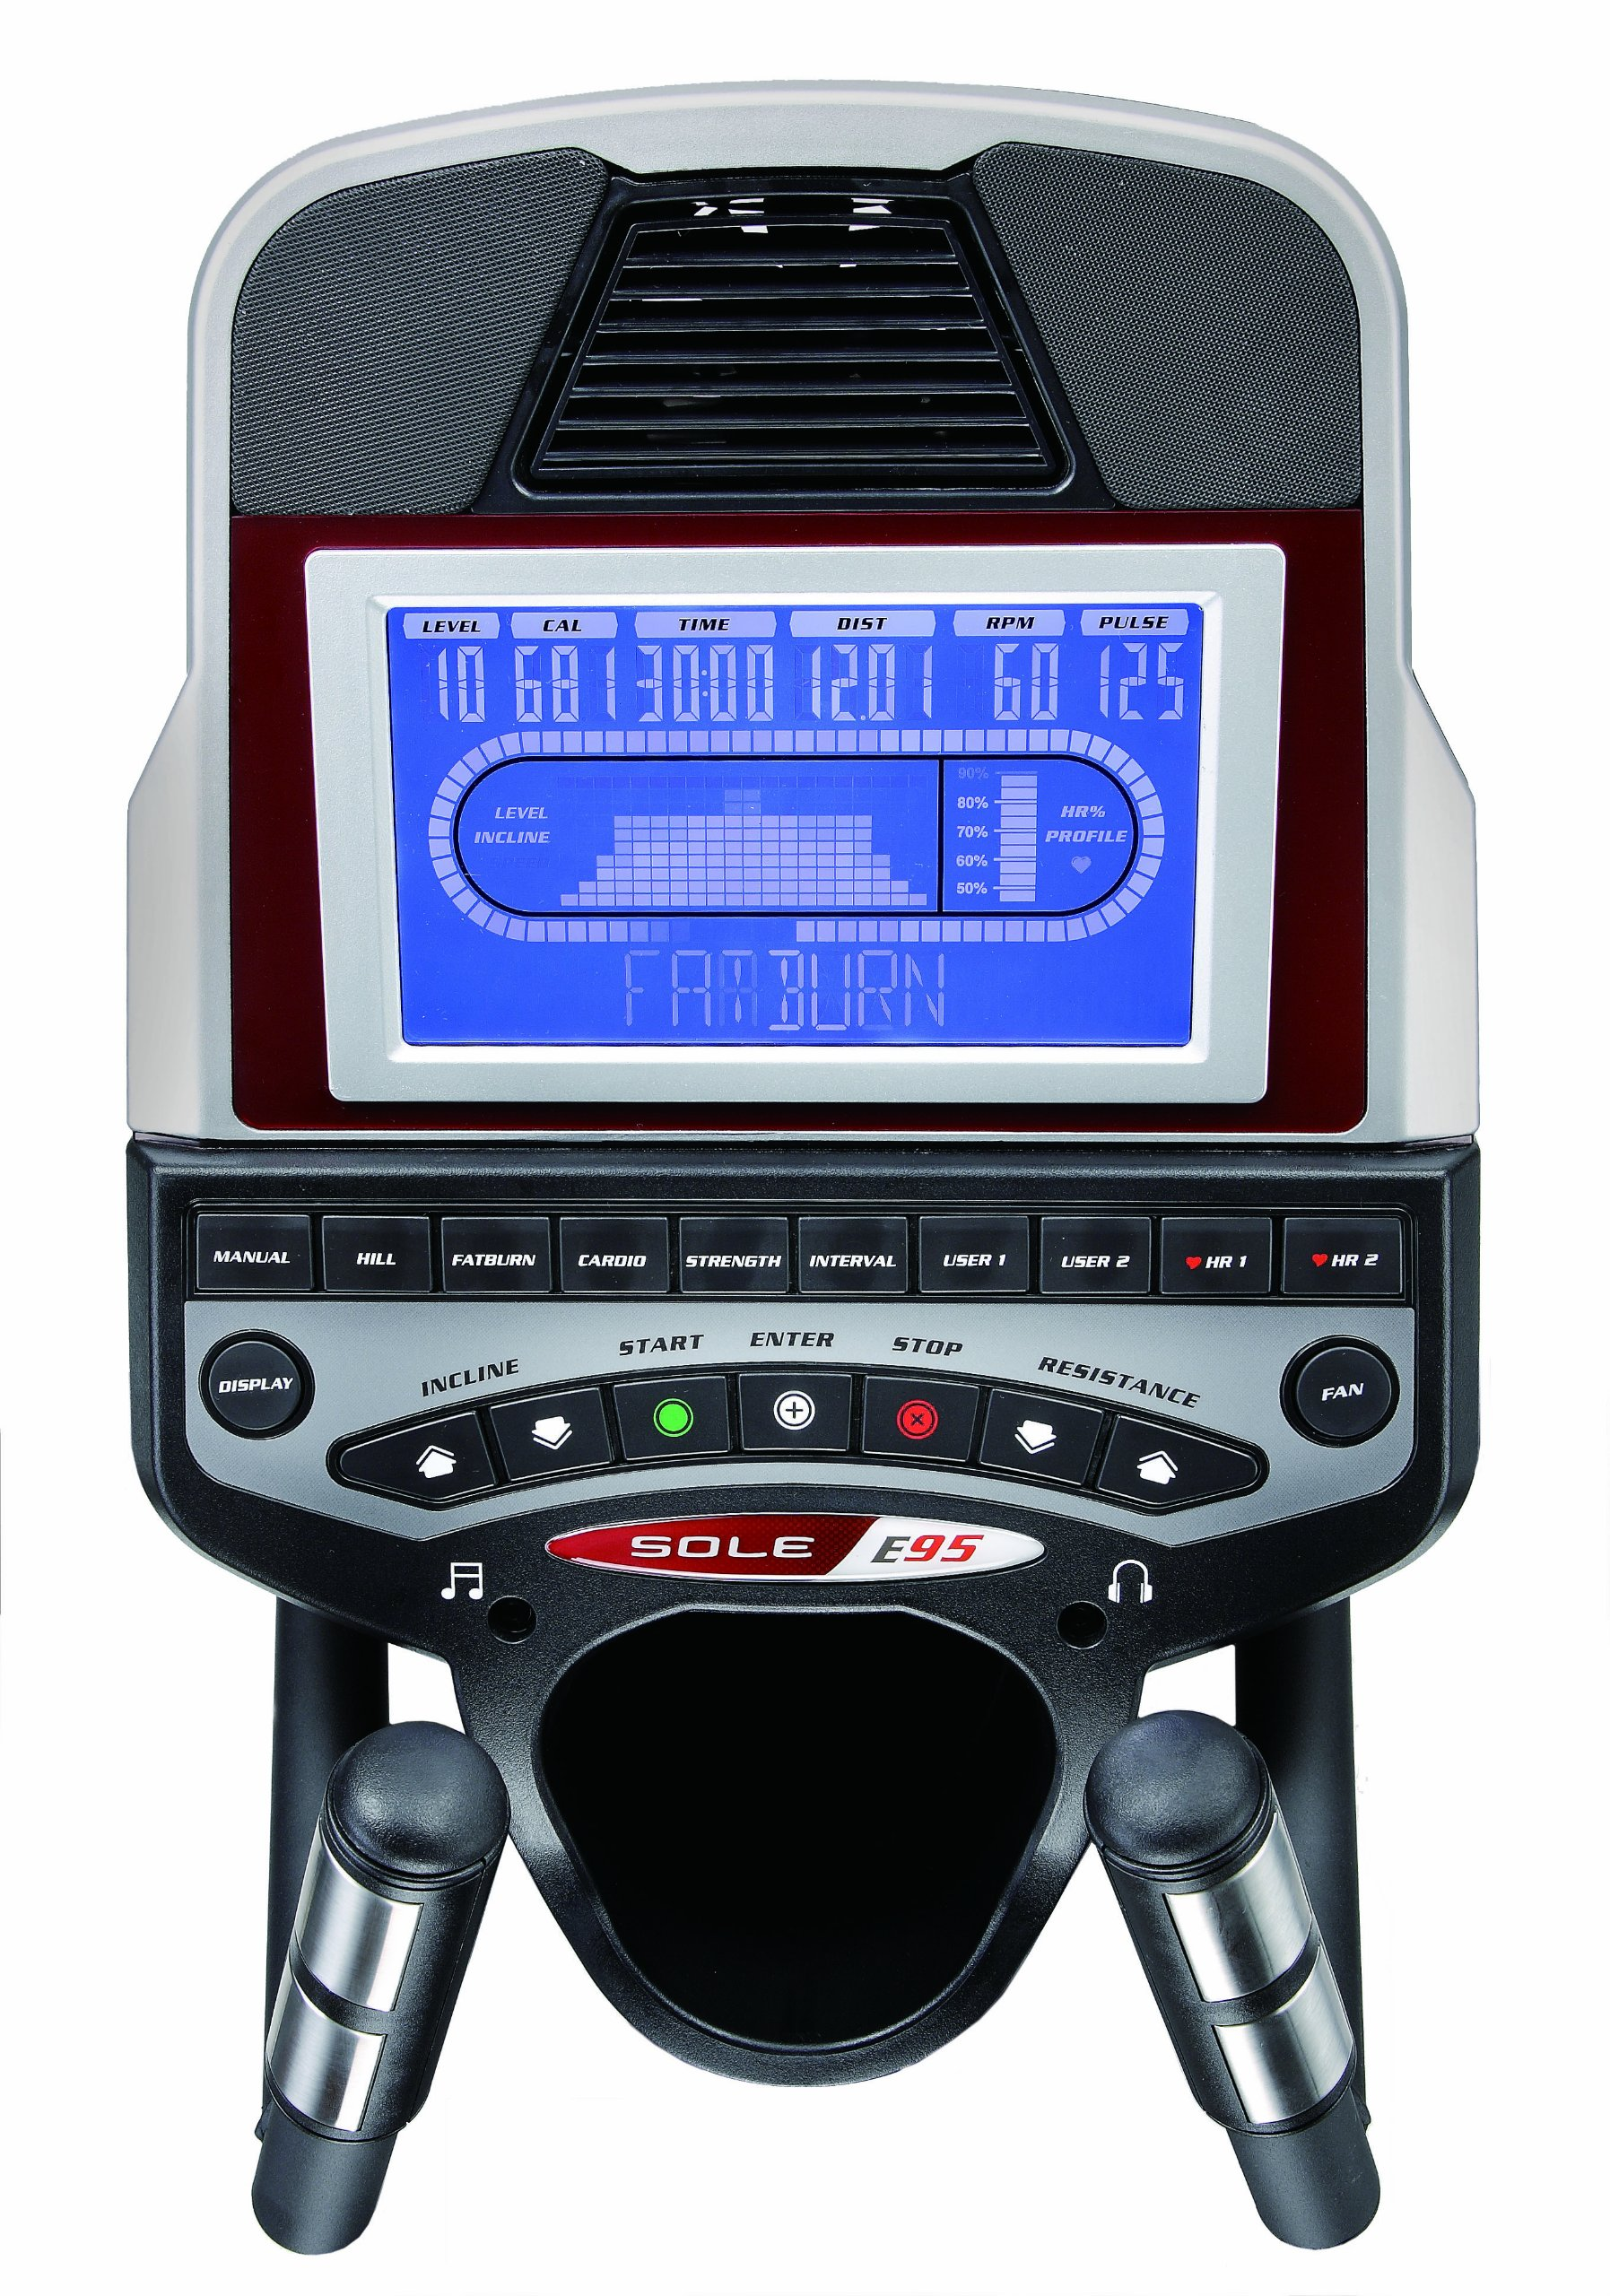 Sole Fitness E95 Elliptical Machine by SOLE